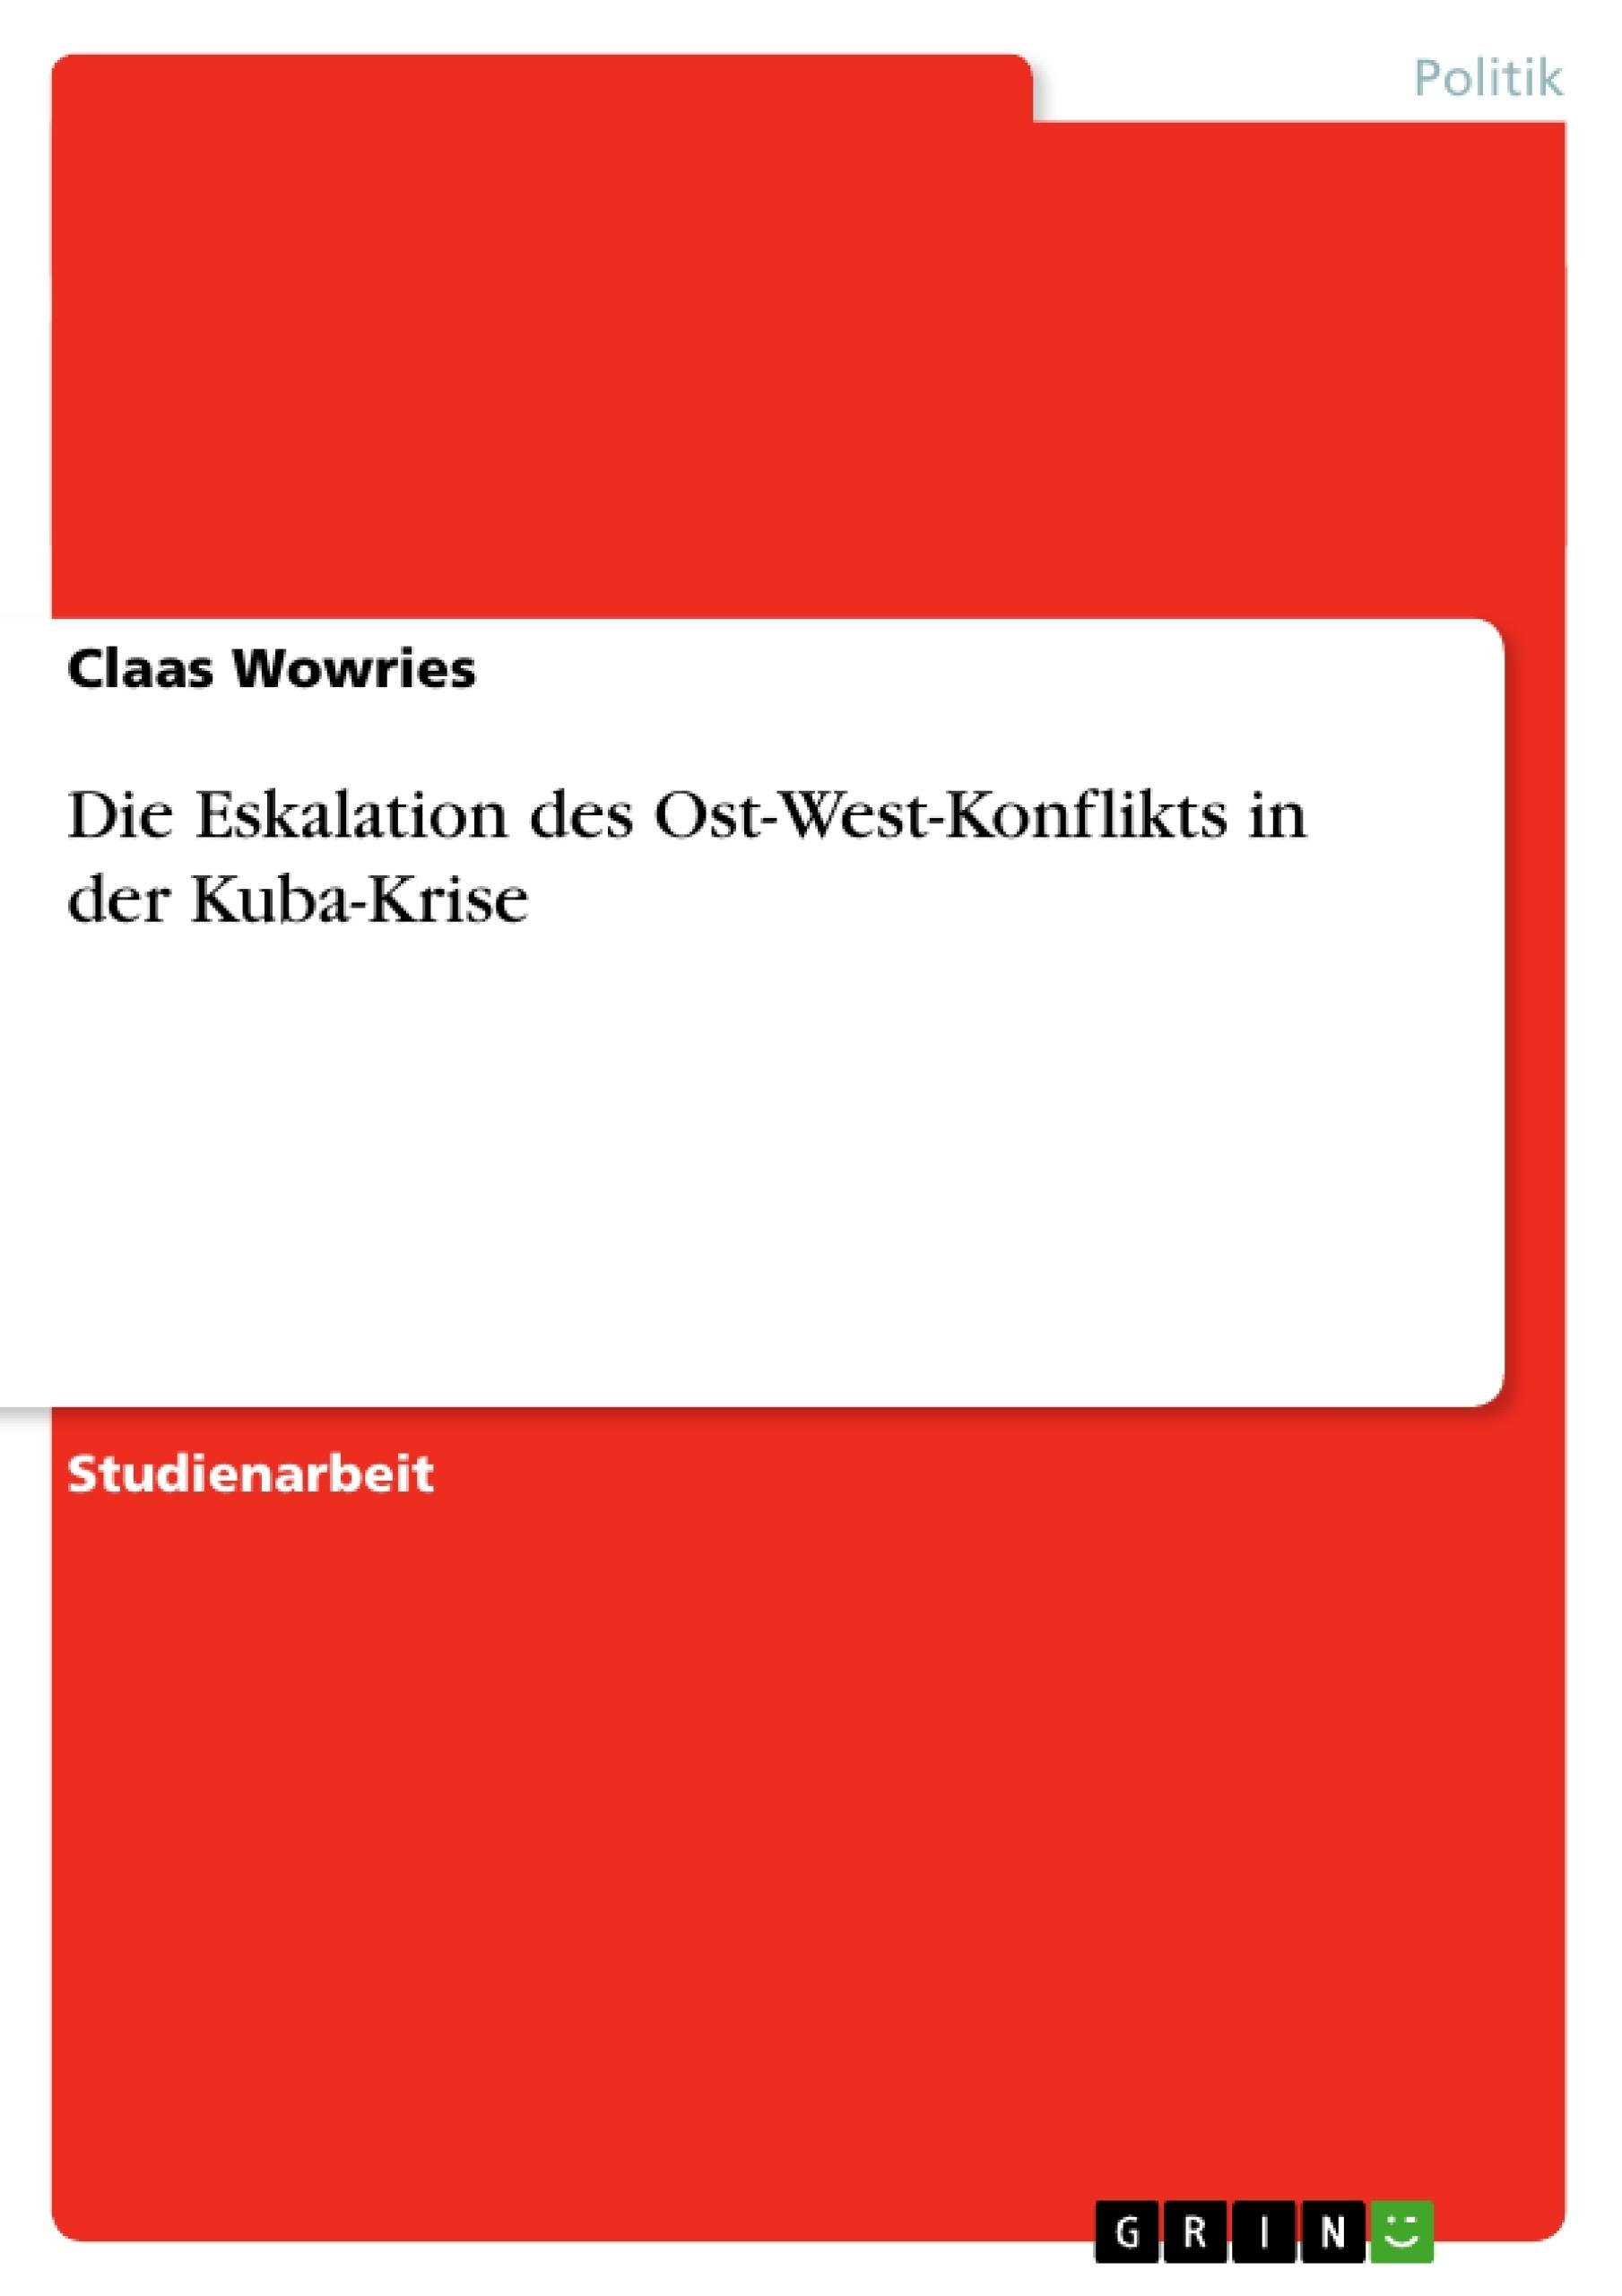 Titel: Die Eskalation des Ost-West-Konflikts in der Kuba-Krise